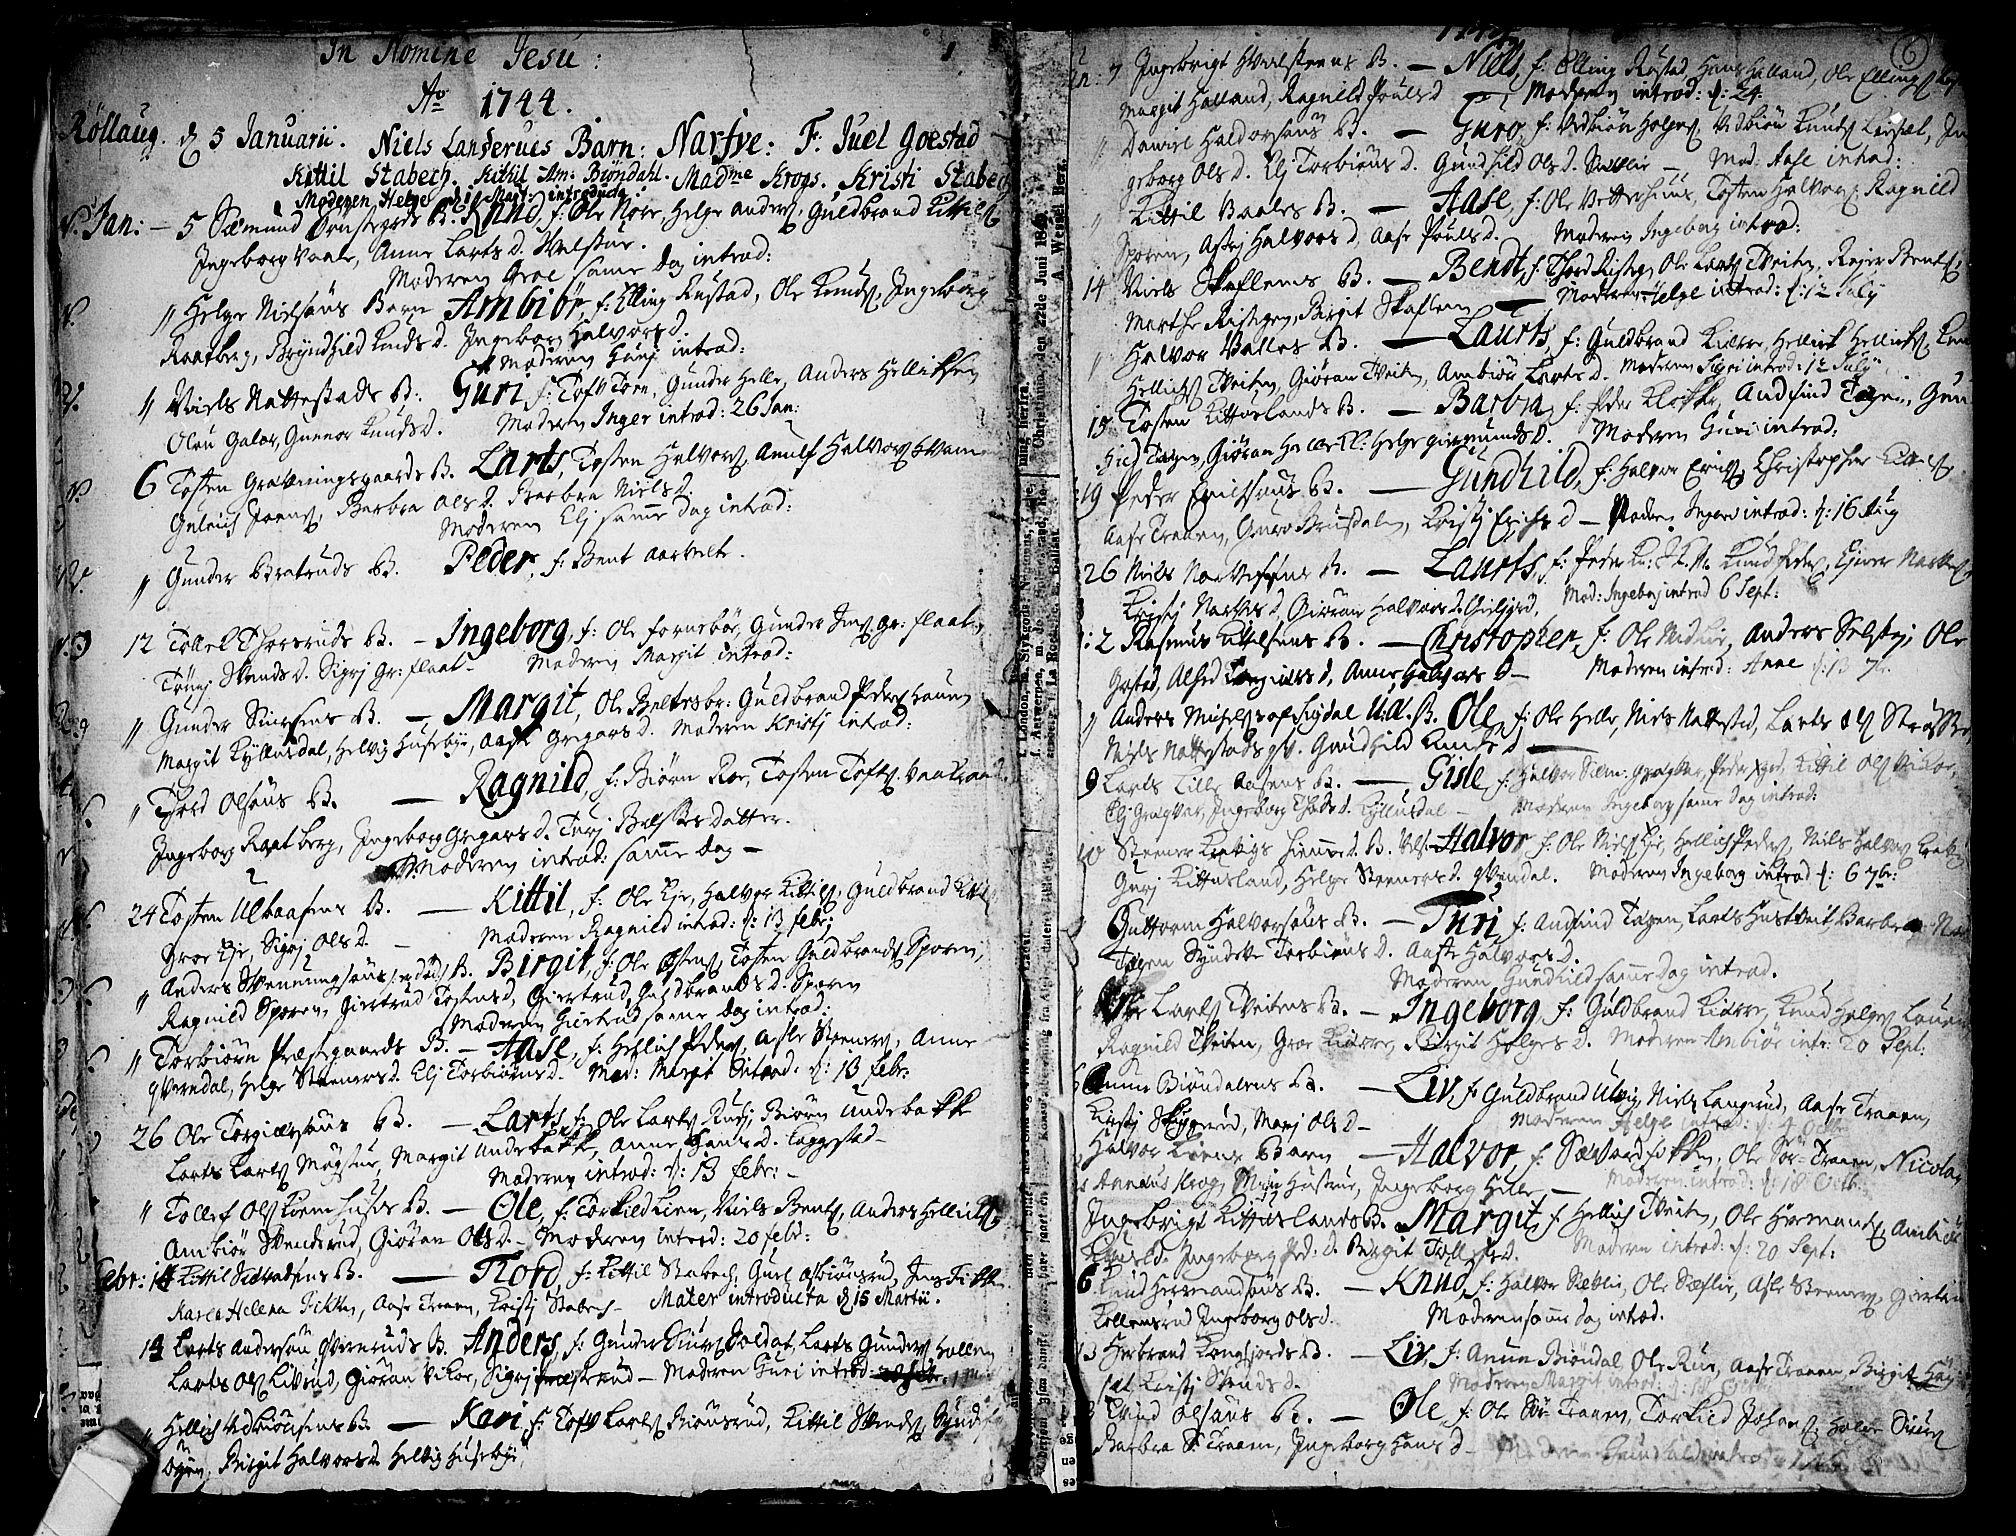 SAKO, Rollag kirkebøker, F/Fa/L0003: Ministerialbok nr. I 3, 1743-1778, s. 6